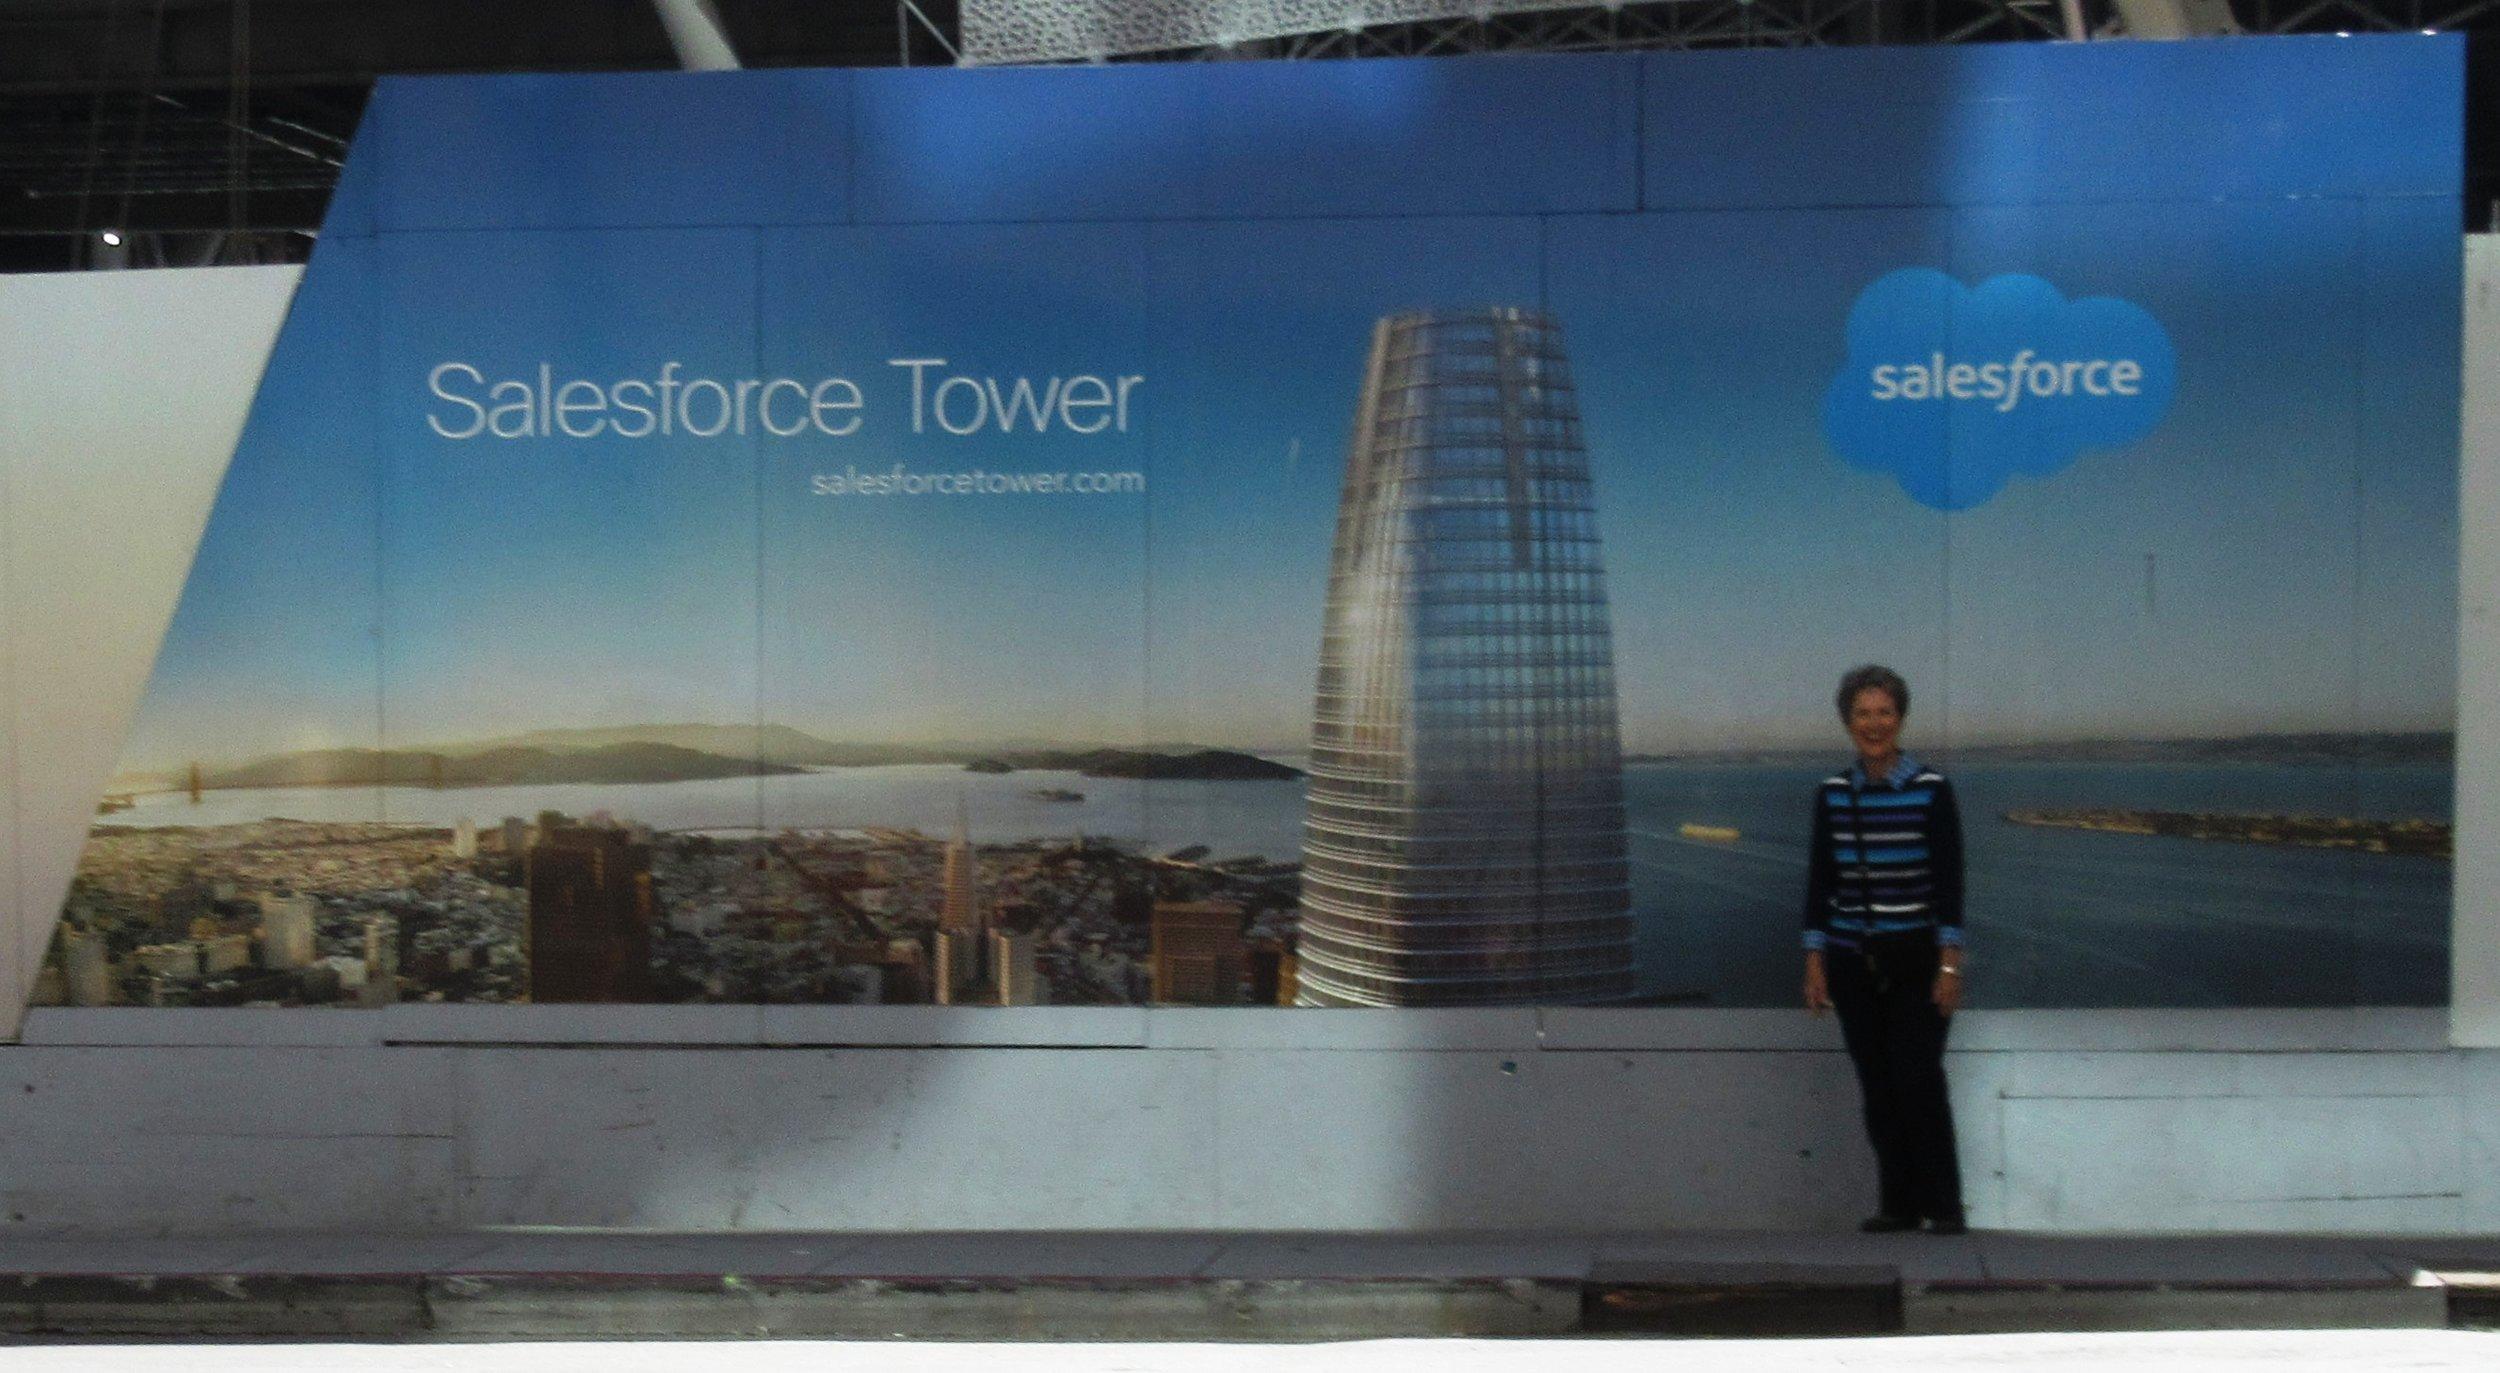 VOLUNTEER DATABASE ADMINISTRATOR Margaret Magnus in front of a photo of the new Salesforce Tower under construction in San Francisco, September 2016. (Photo: Sam Ervin)